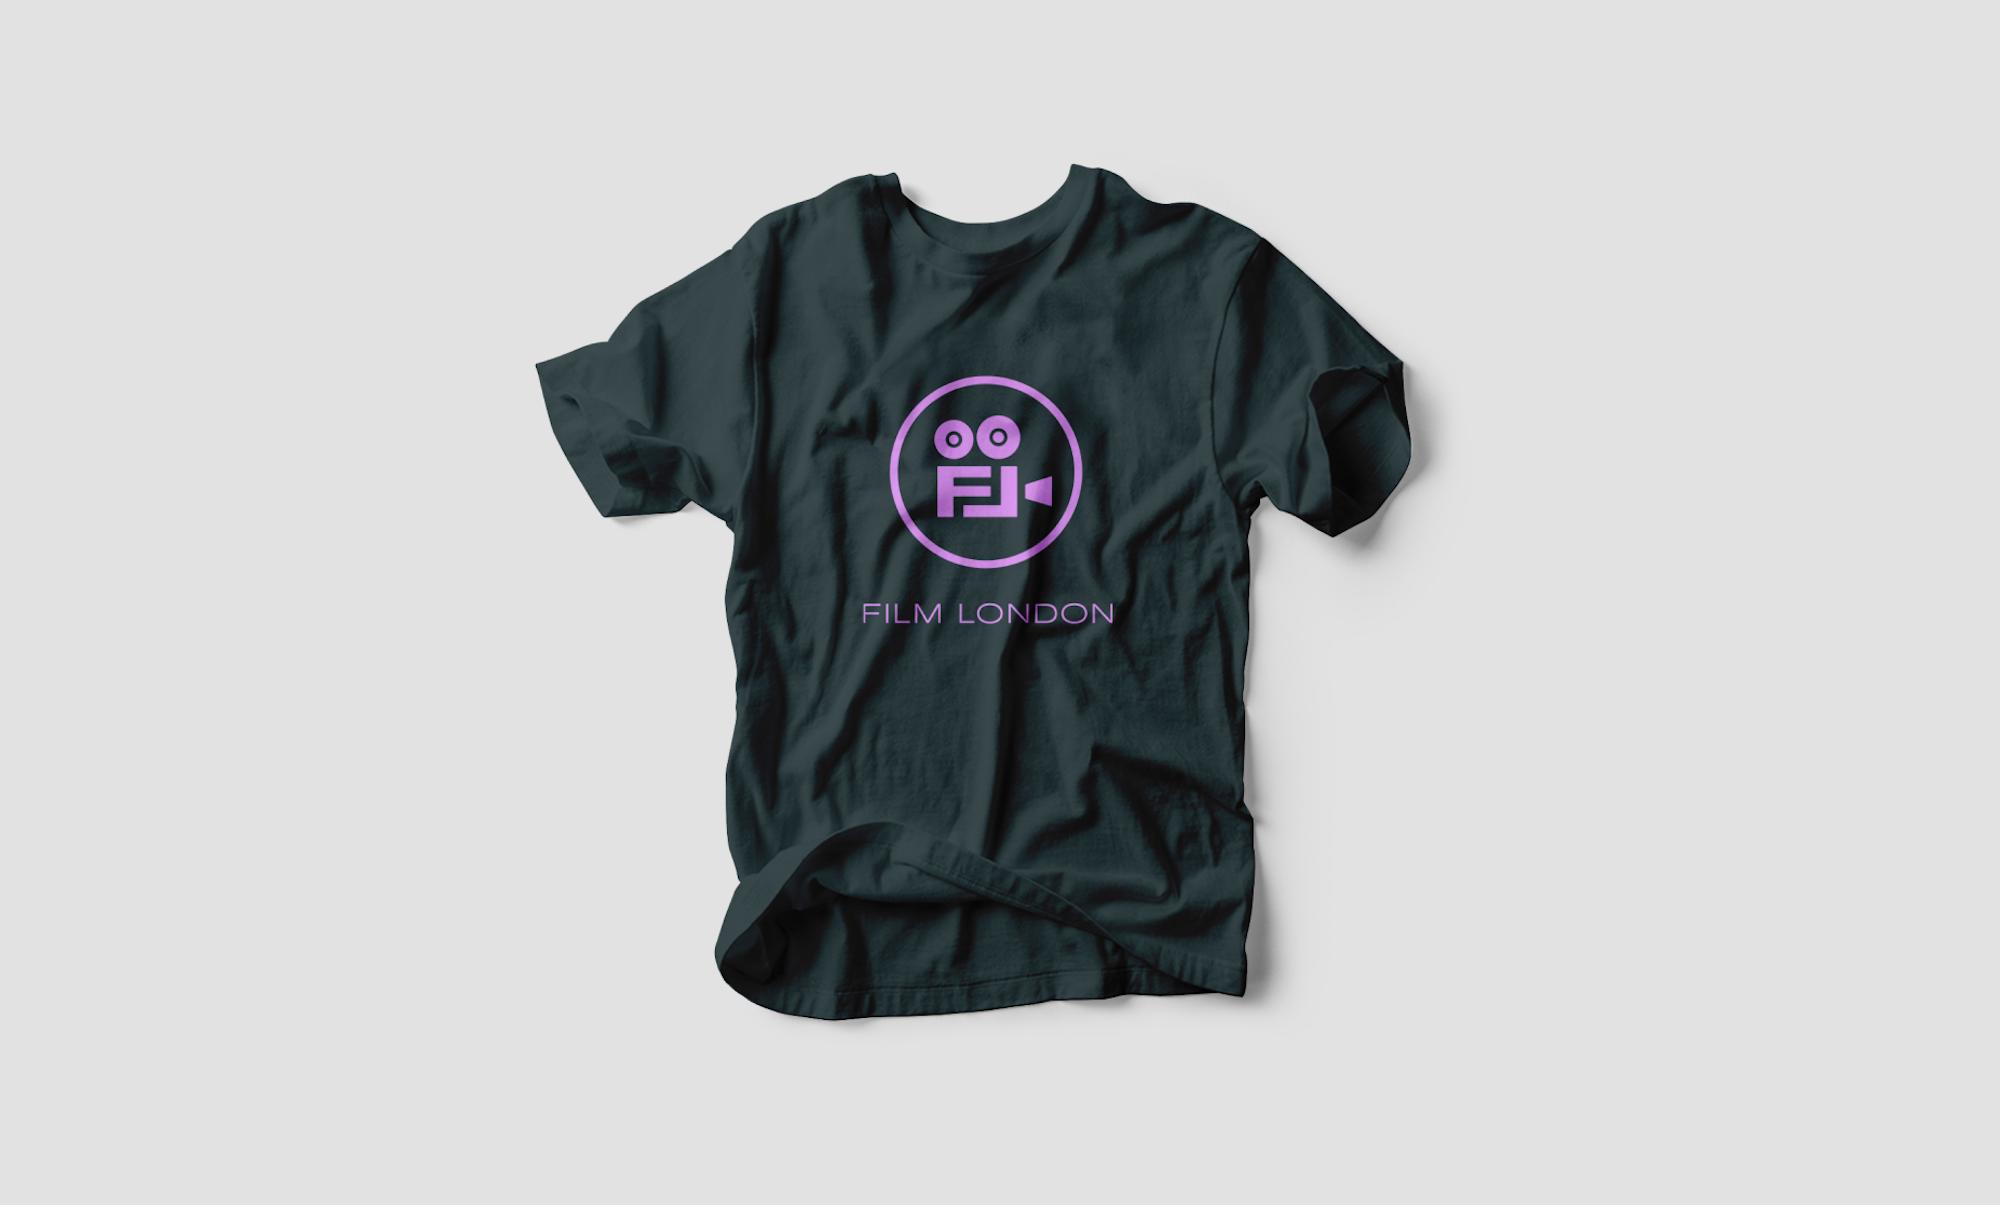 Black t-shirt with purple Film London logo